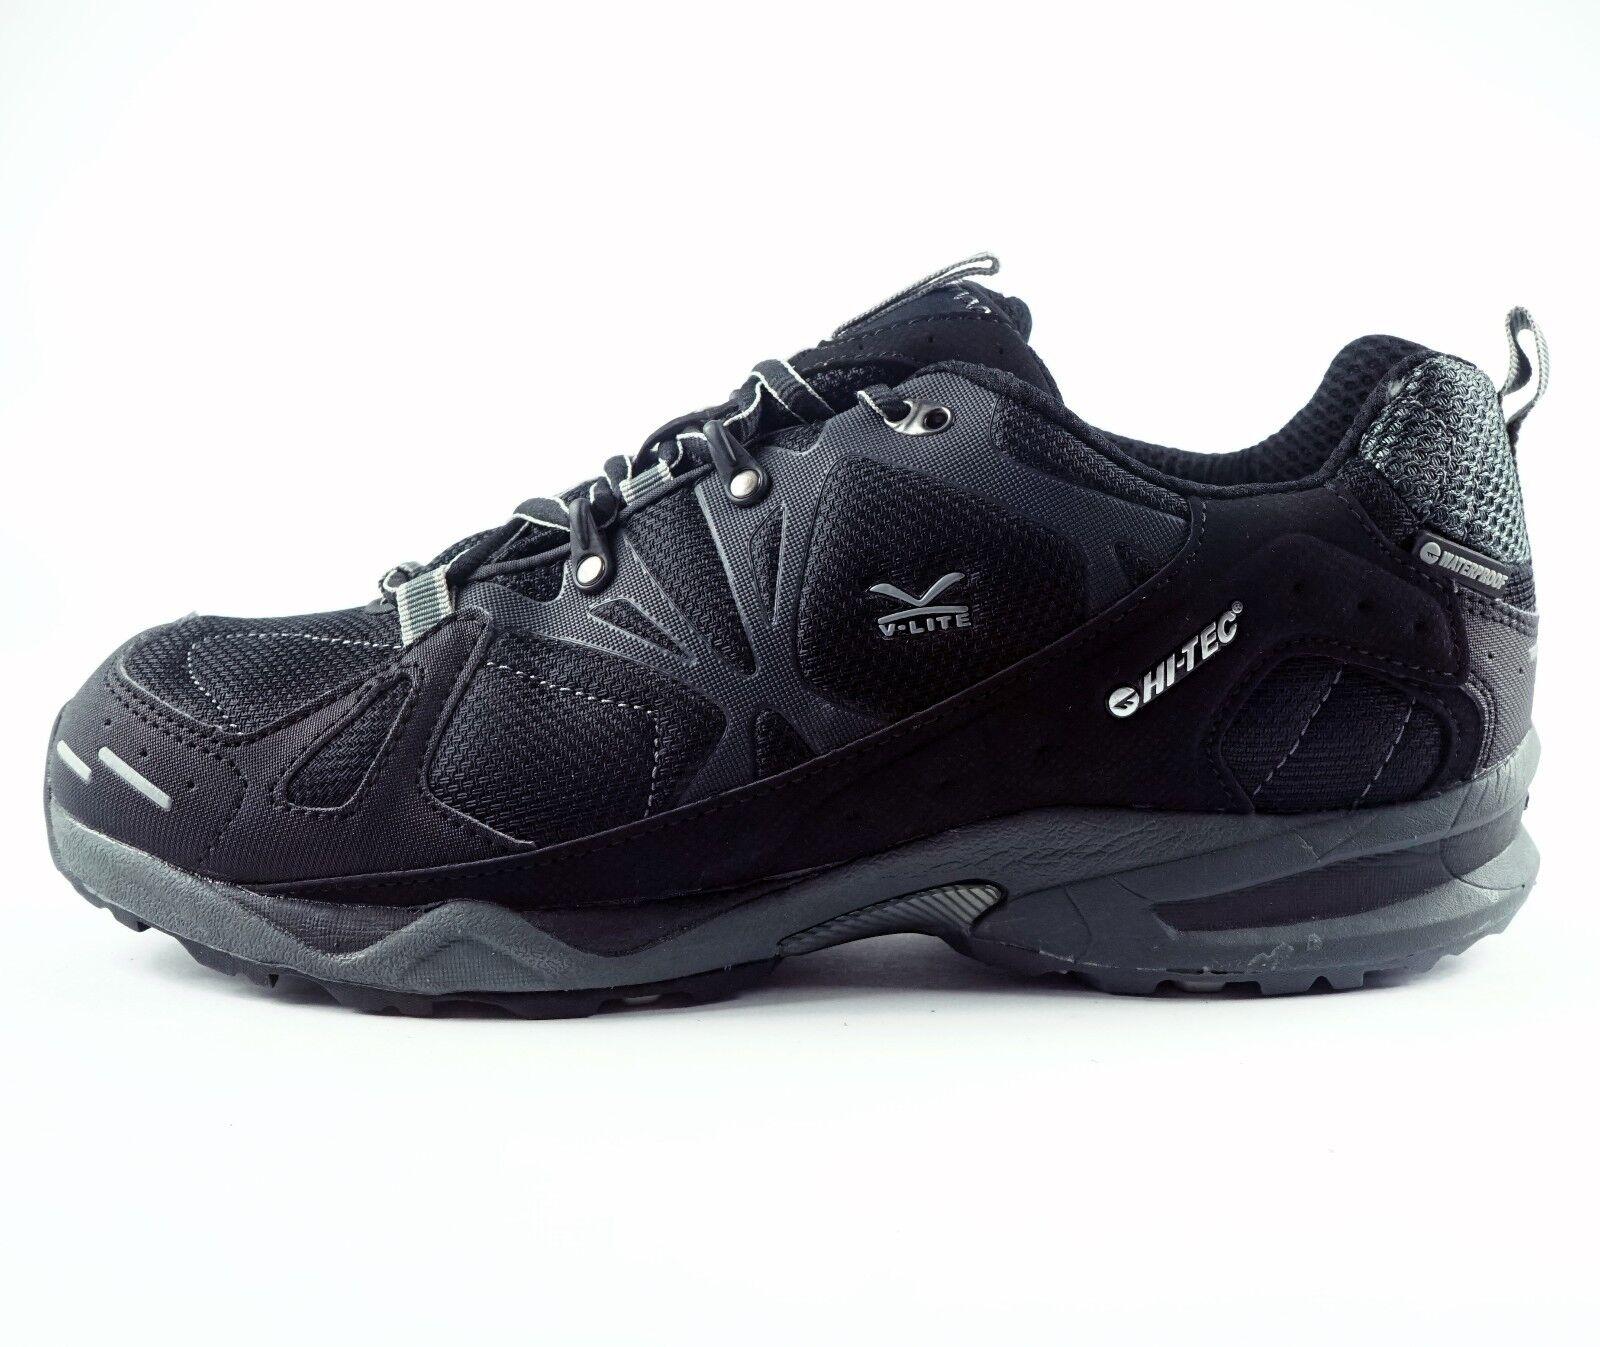 HI-TEC Mens Athletic Trekking Waterproof shoes US SIZE 10(For sale)